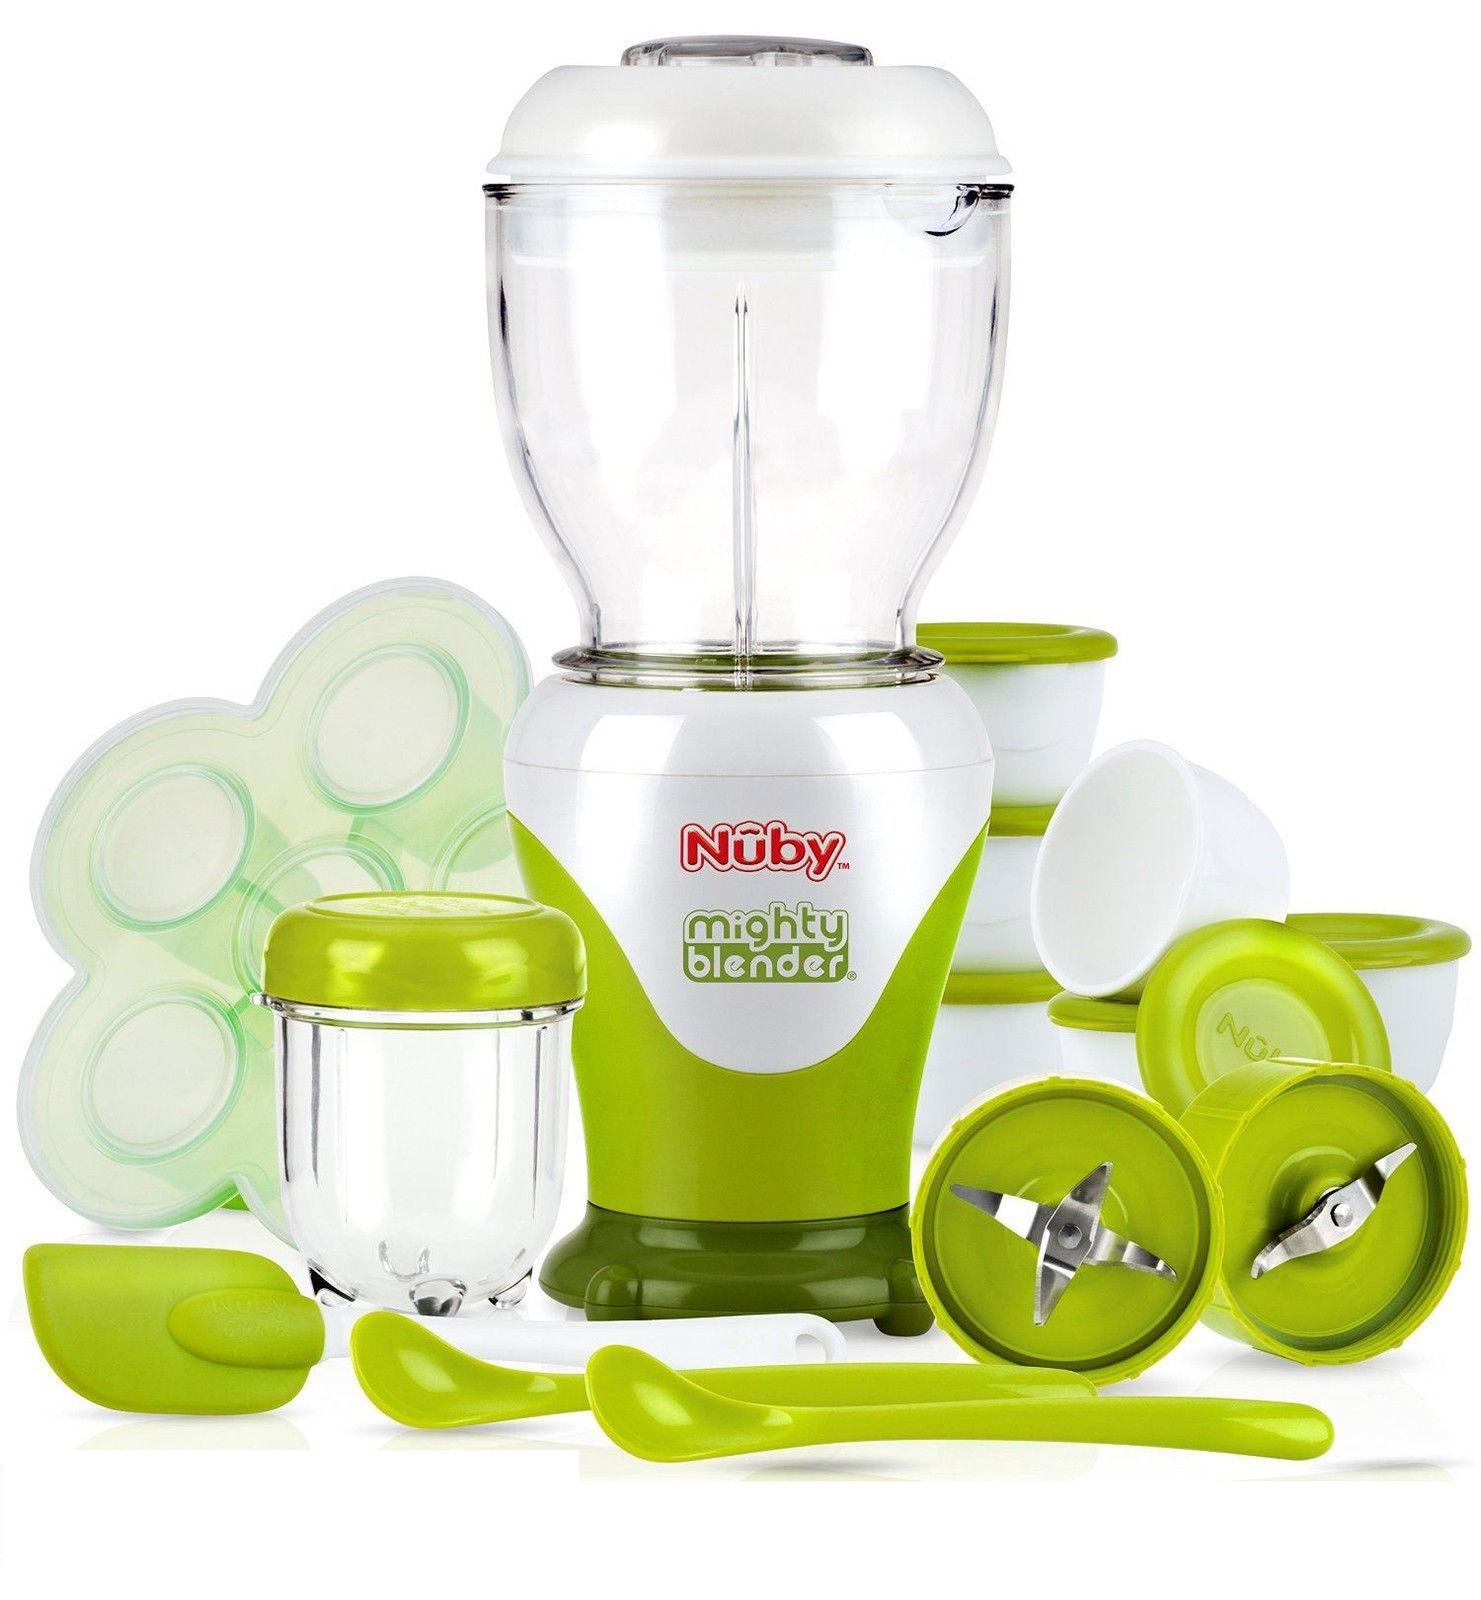 Nuby Baby Garden Fresh Steamer Basket Amp Blender Food